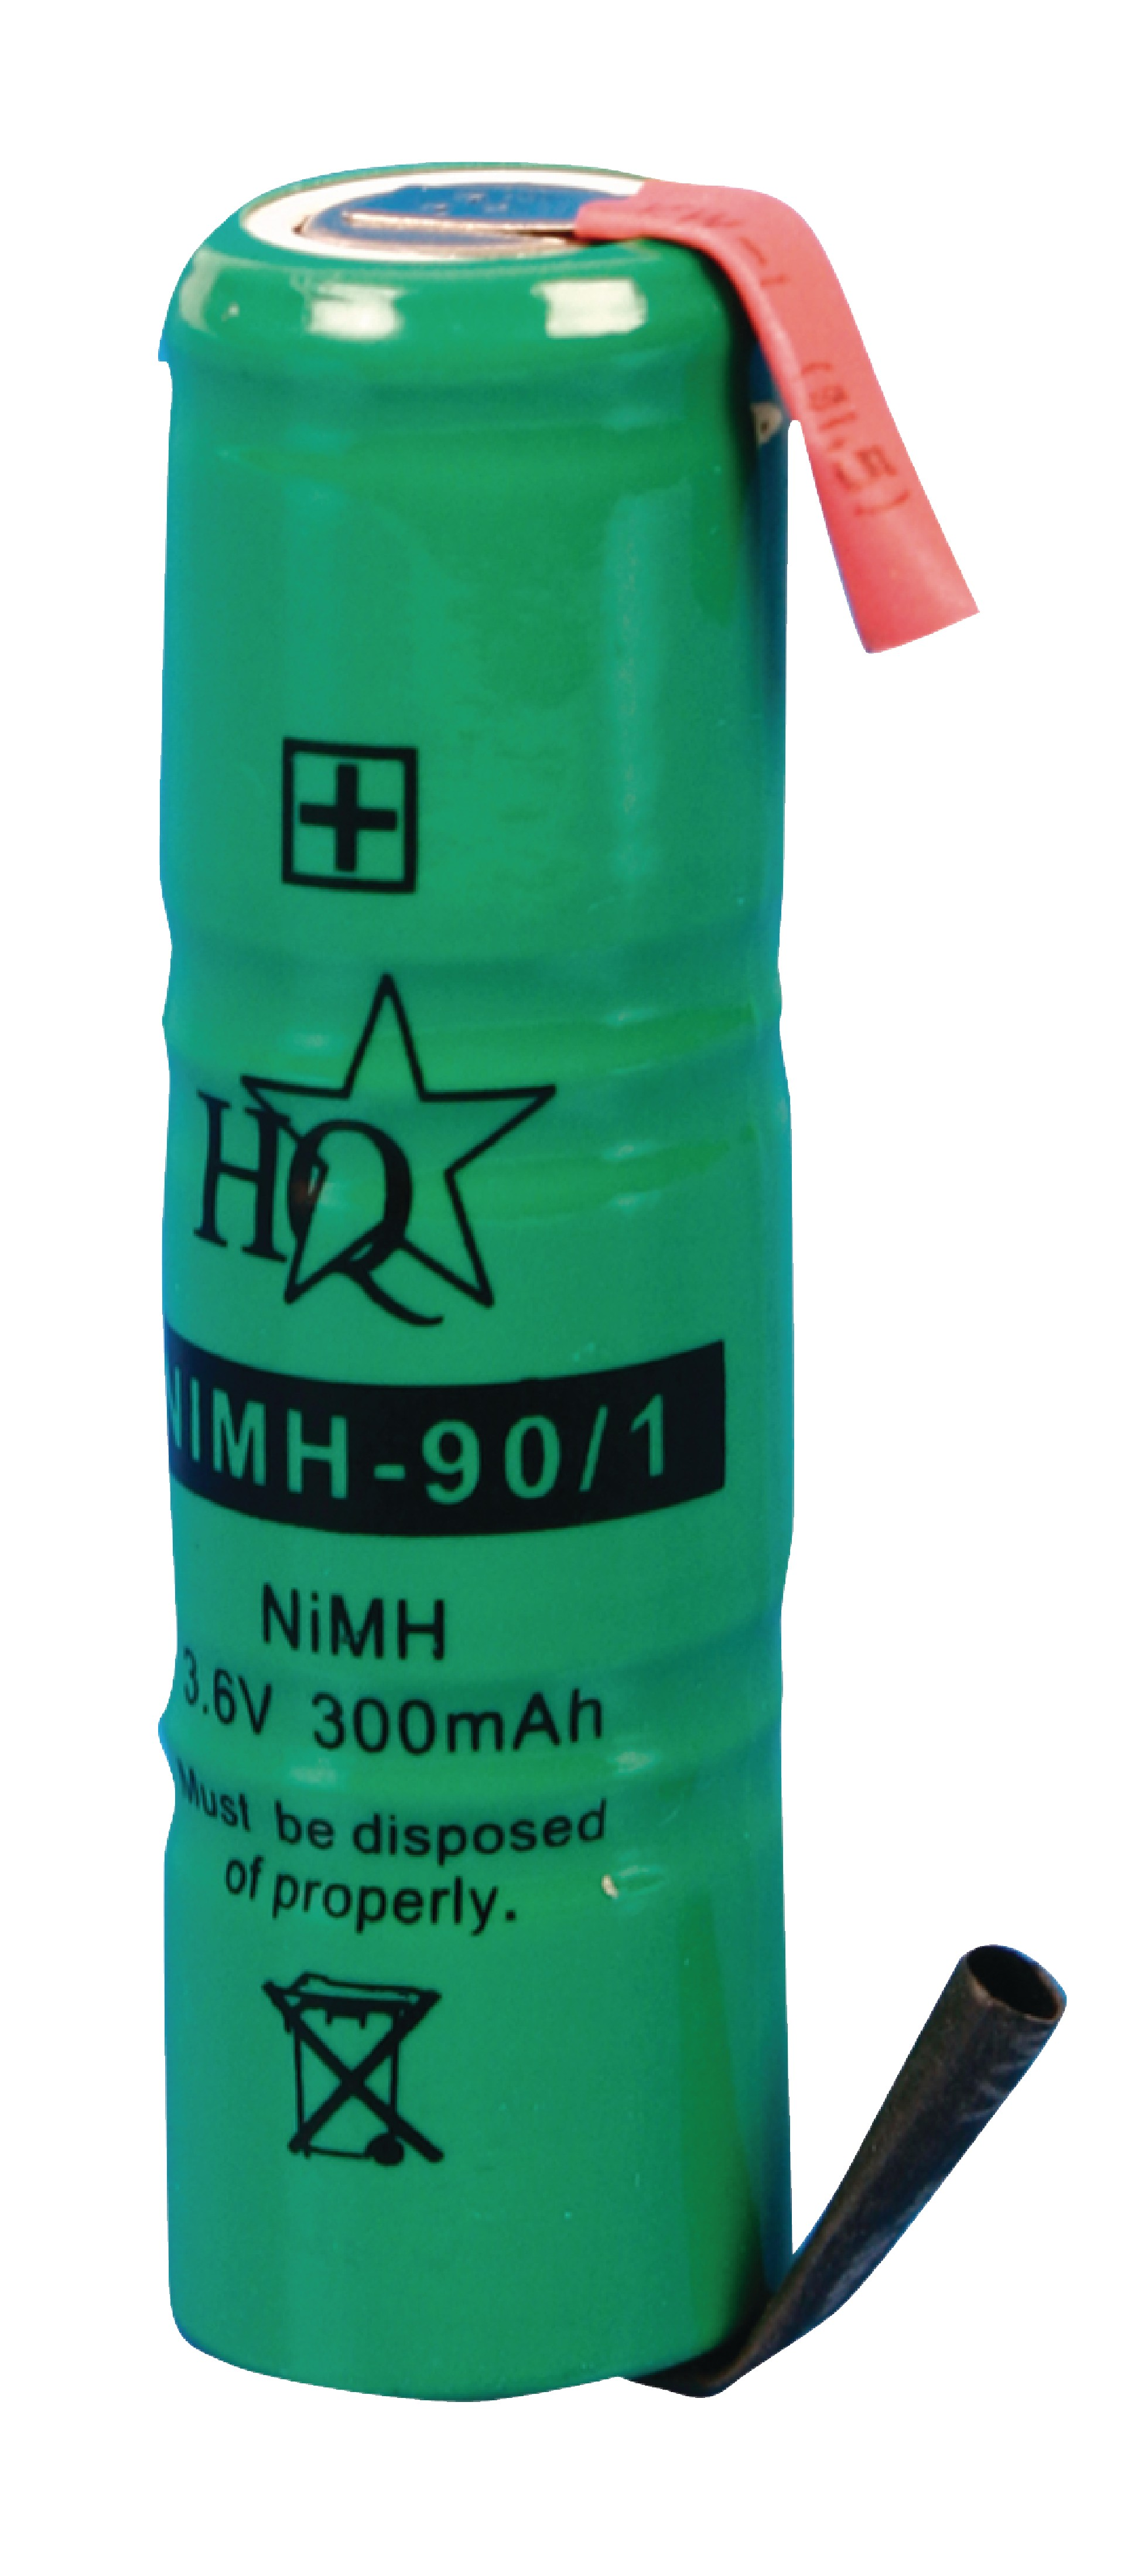 Akumulátor NiMH 3.6V/300mAh, NIMH-90/1